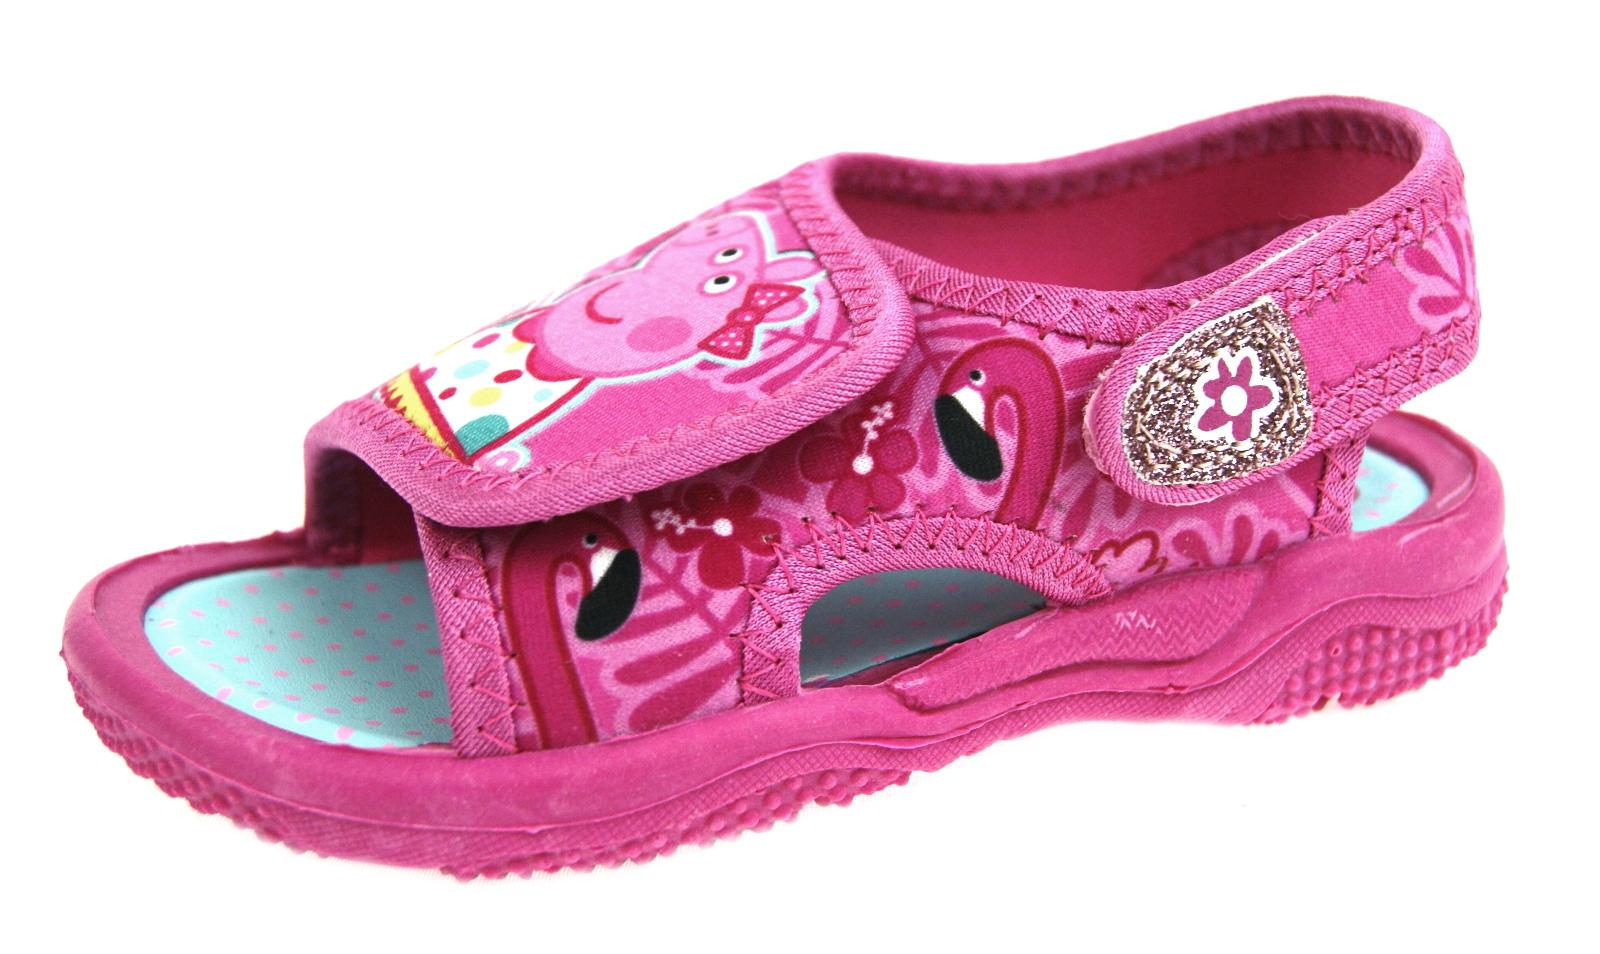 Girls Peppa Pig Waterproof Beach Sports